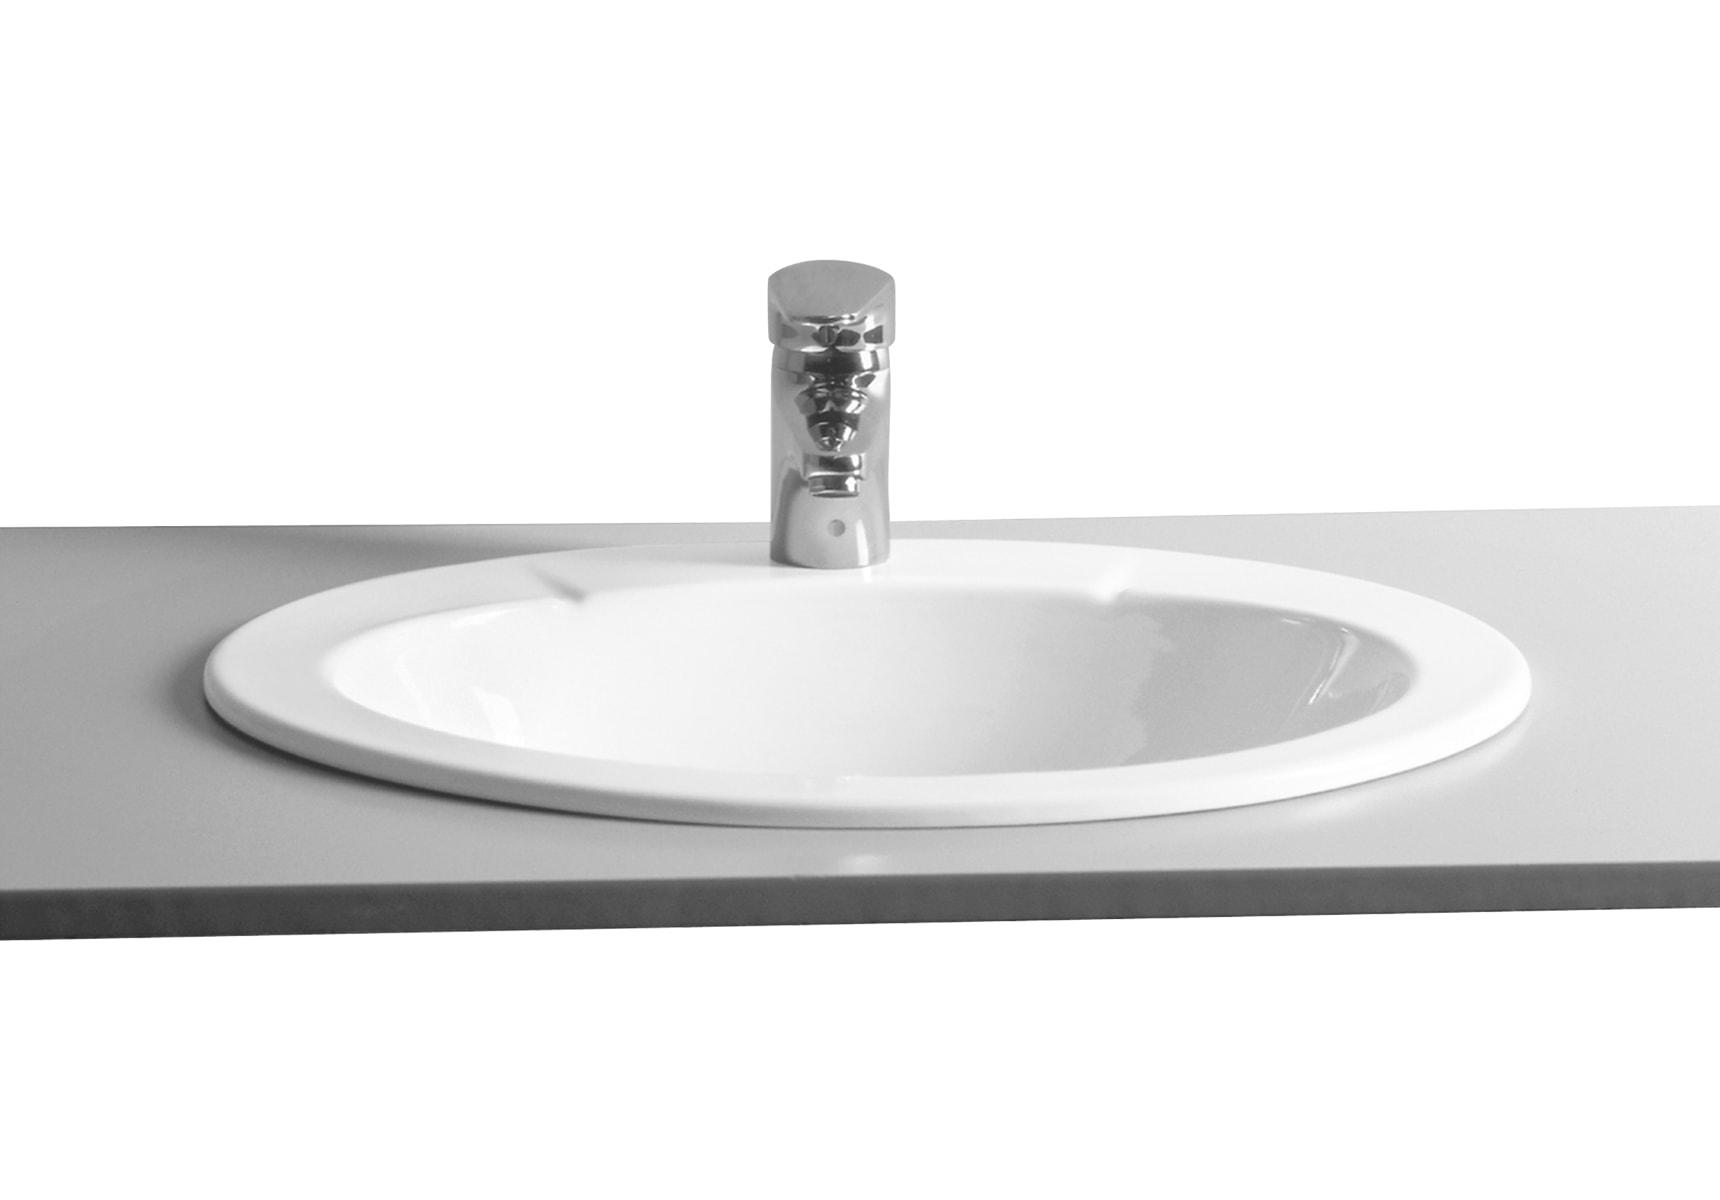 Arkitekt Countertop Basin, 60cm